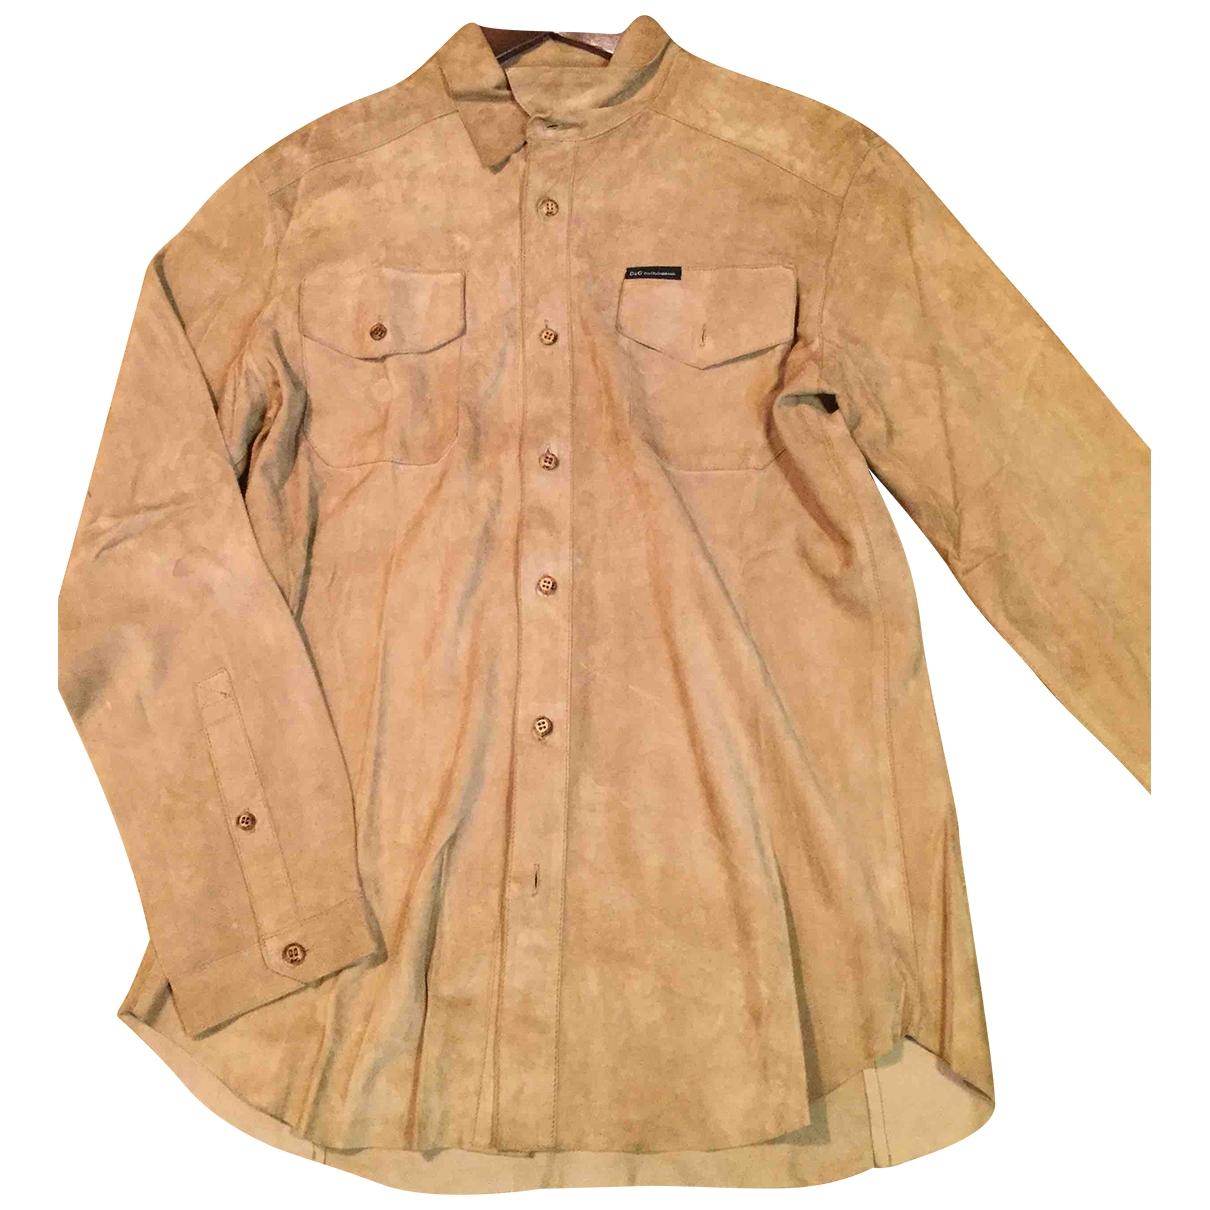 D&g \N Camel Leather Leather jacket for Women L International